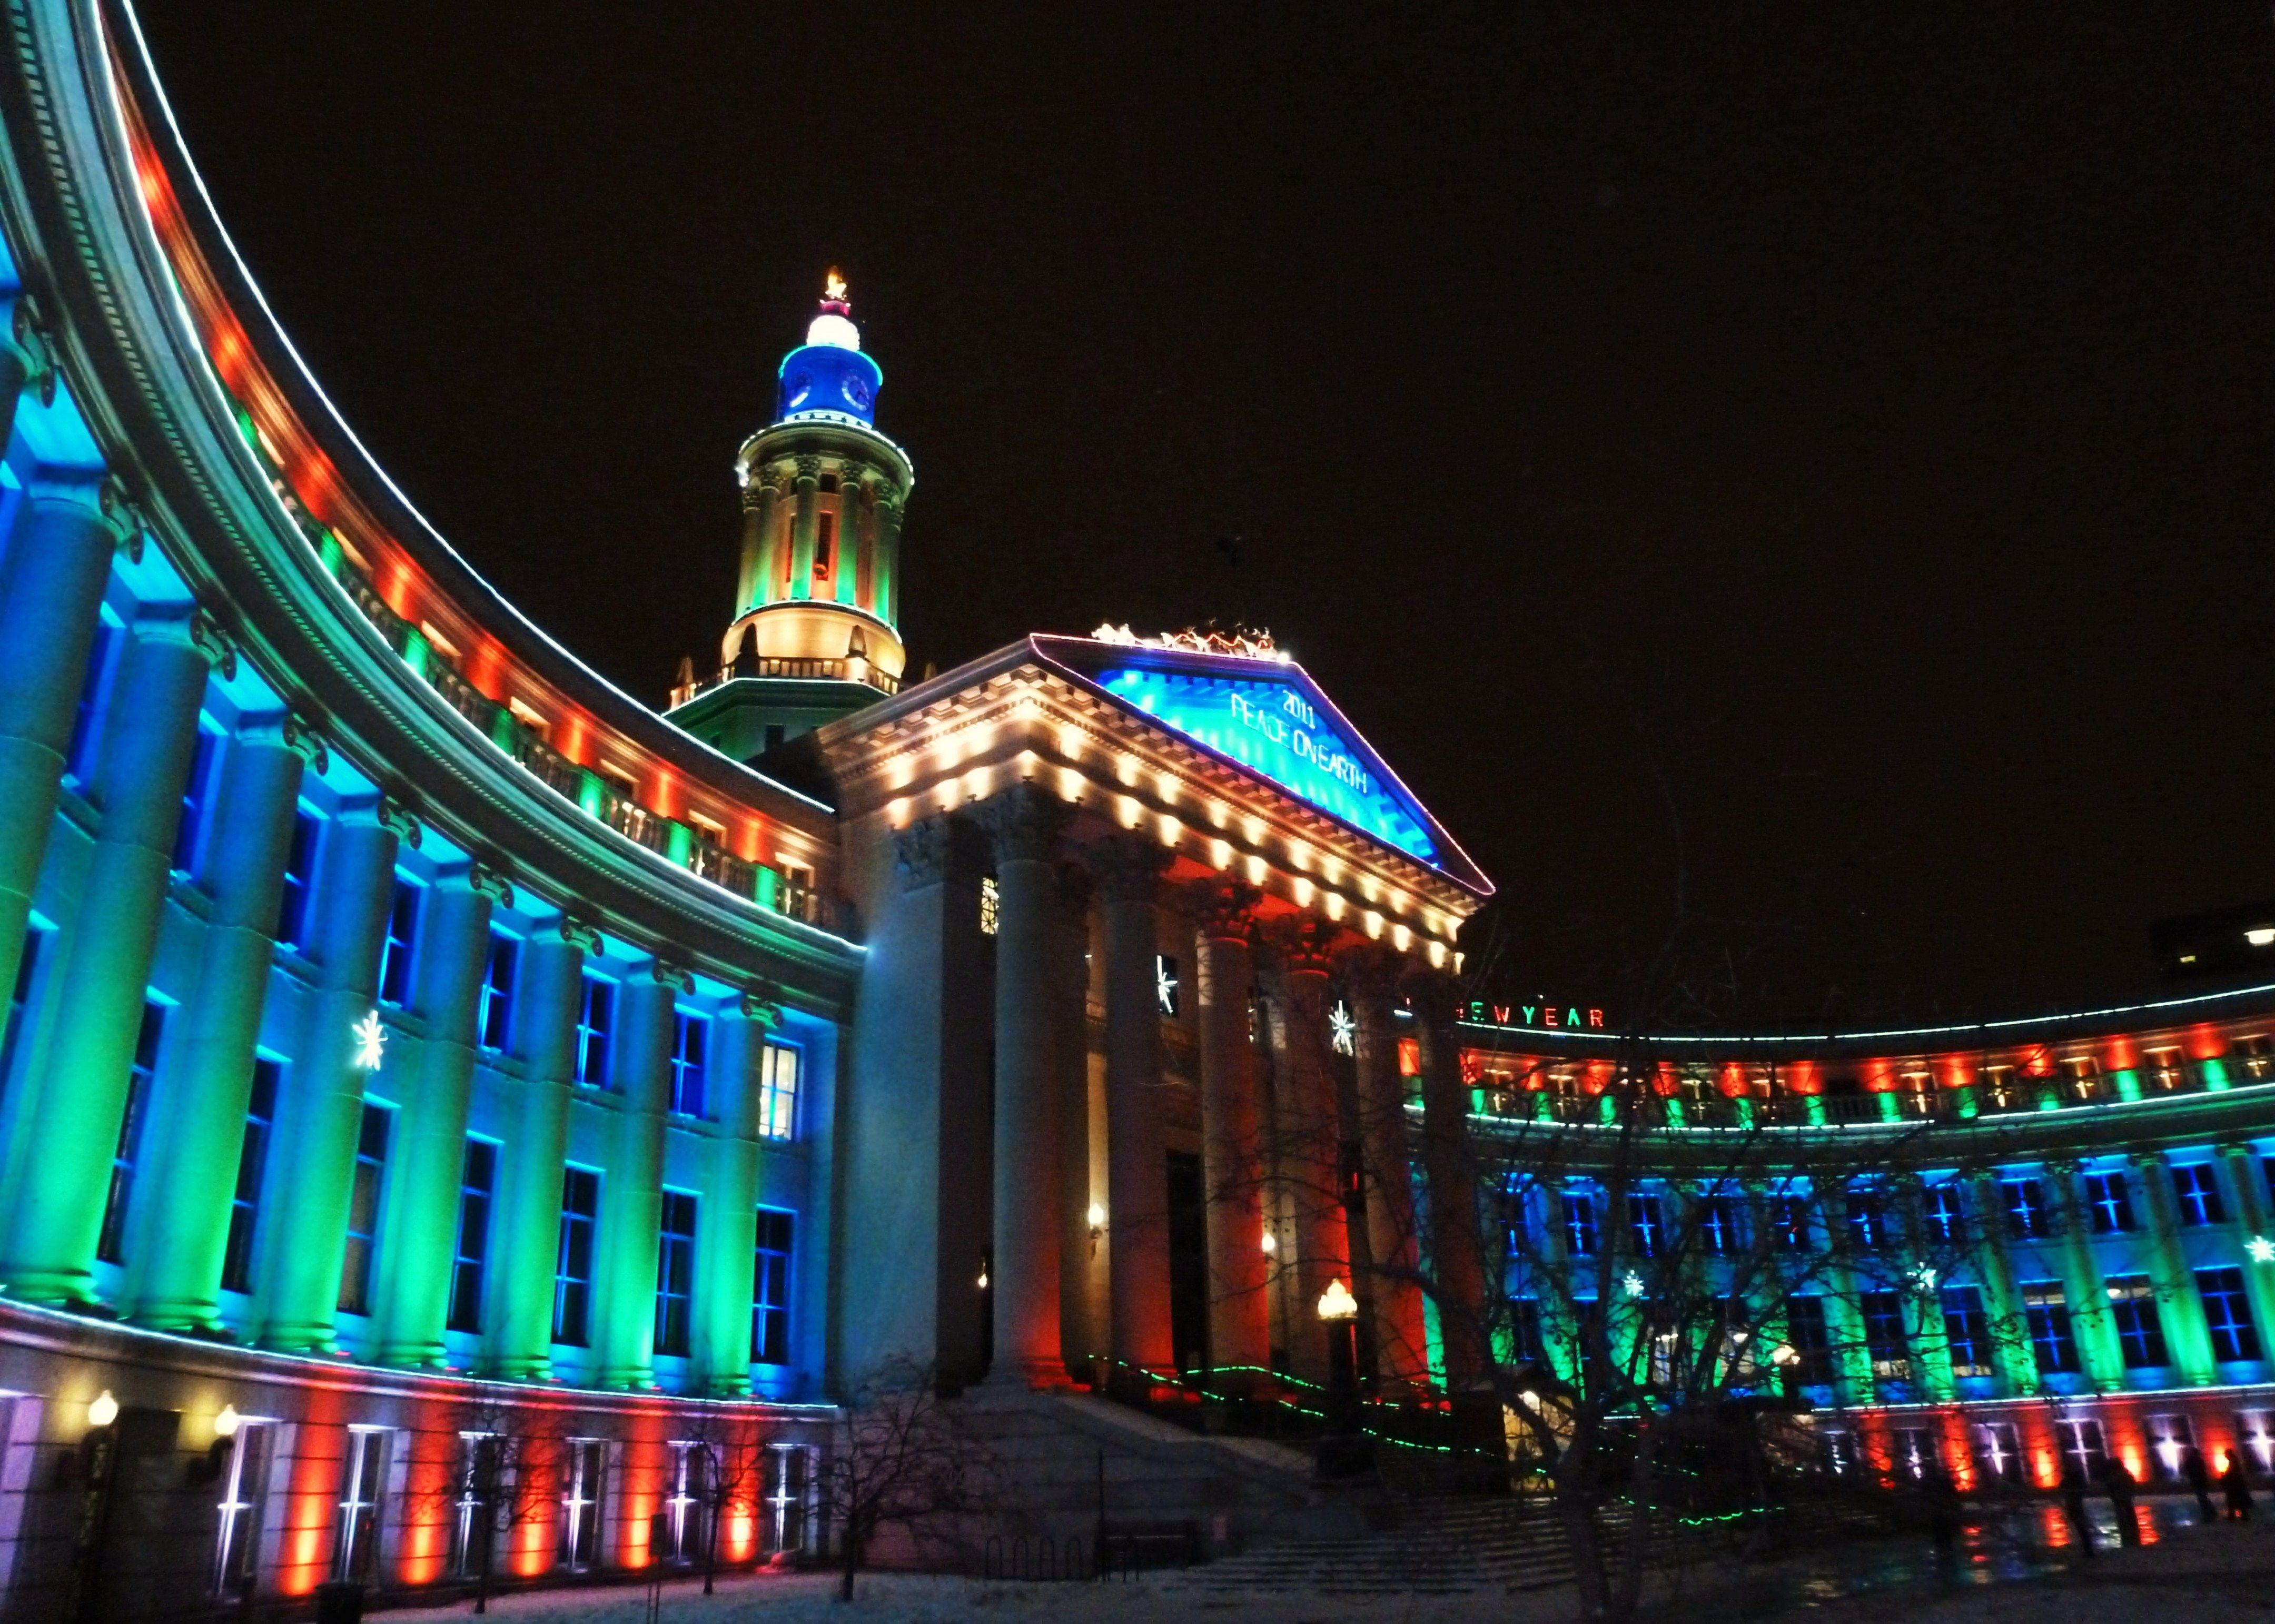 Denver City Building Holiday Lights